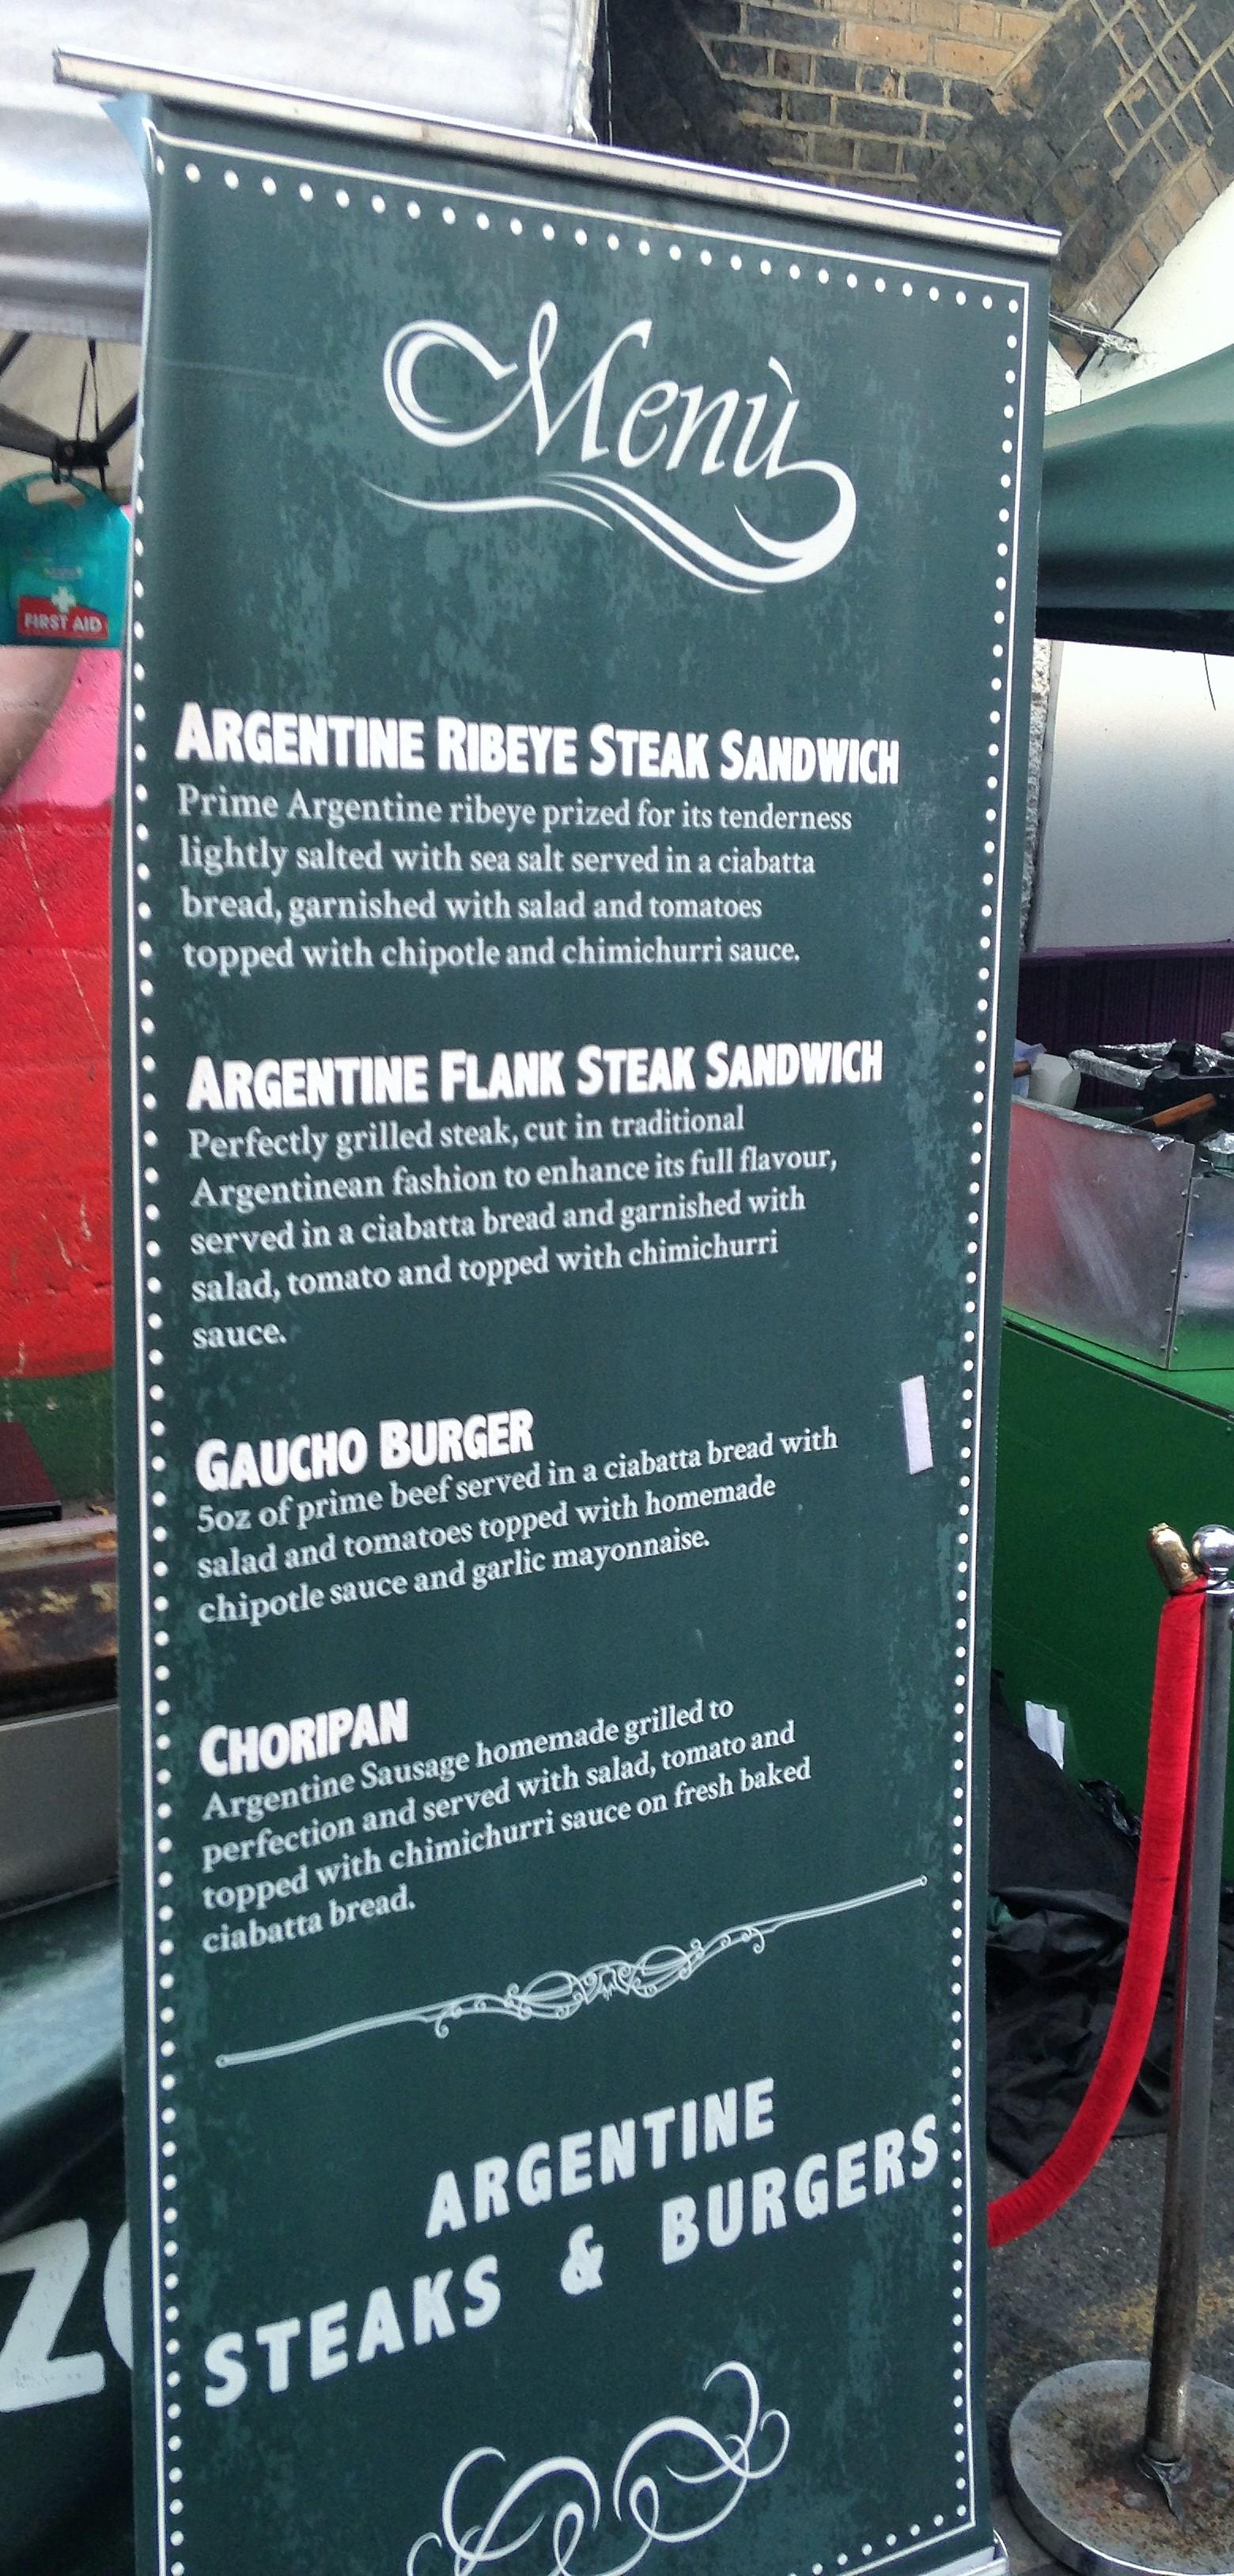 Argentine Steaks & Burgers